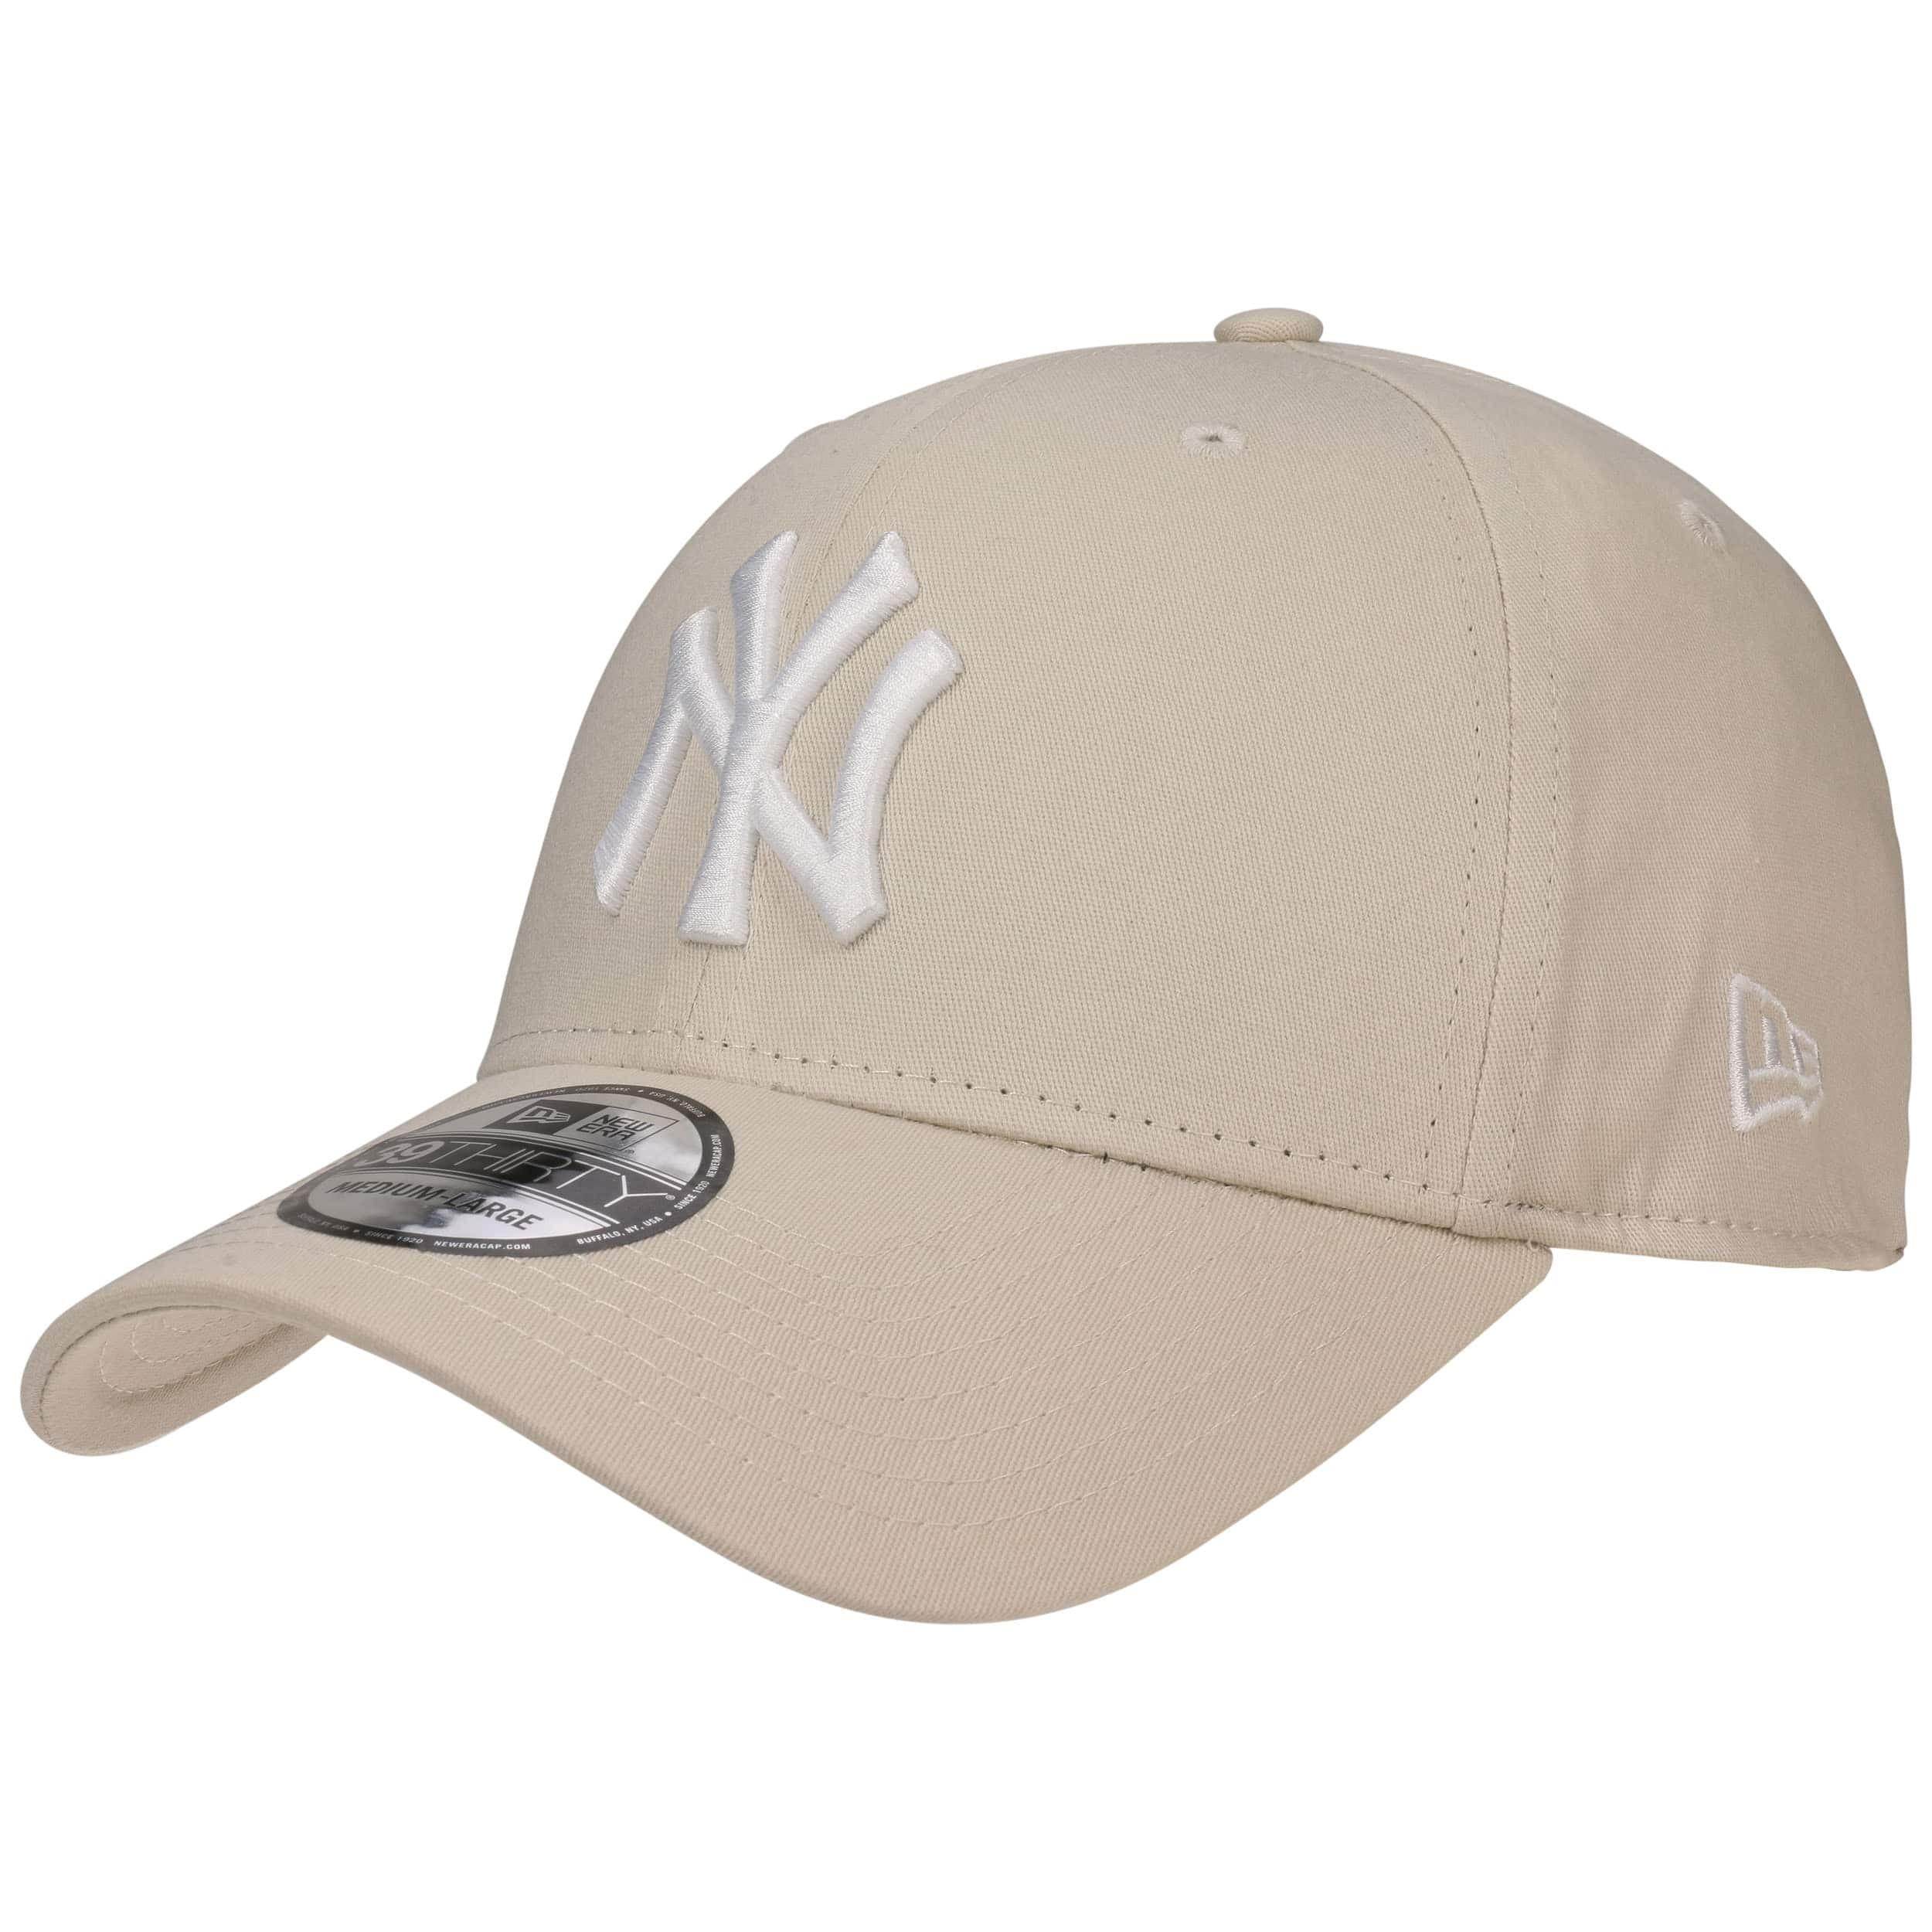 39thirty league ess yankees cap by new era eur 24 95 hats caps beanies shop online. Black Bedroom Furniture Sets. Home Design Ideas